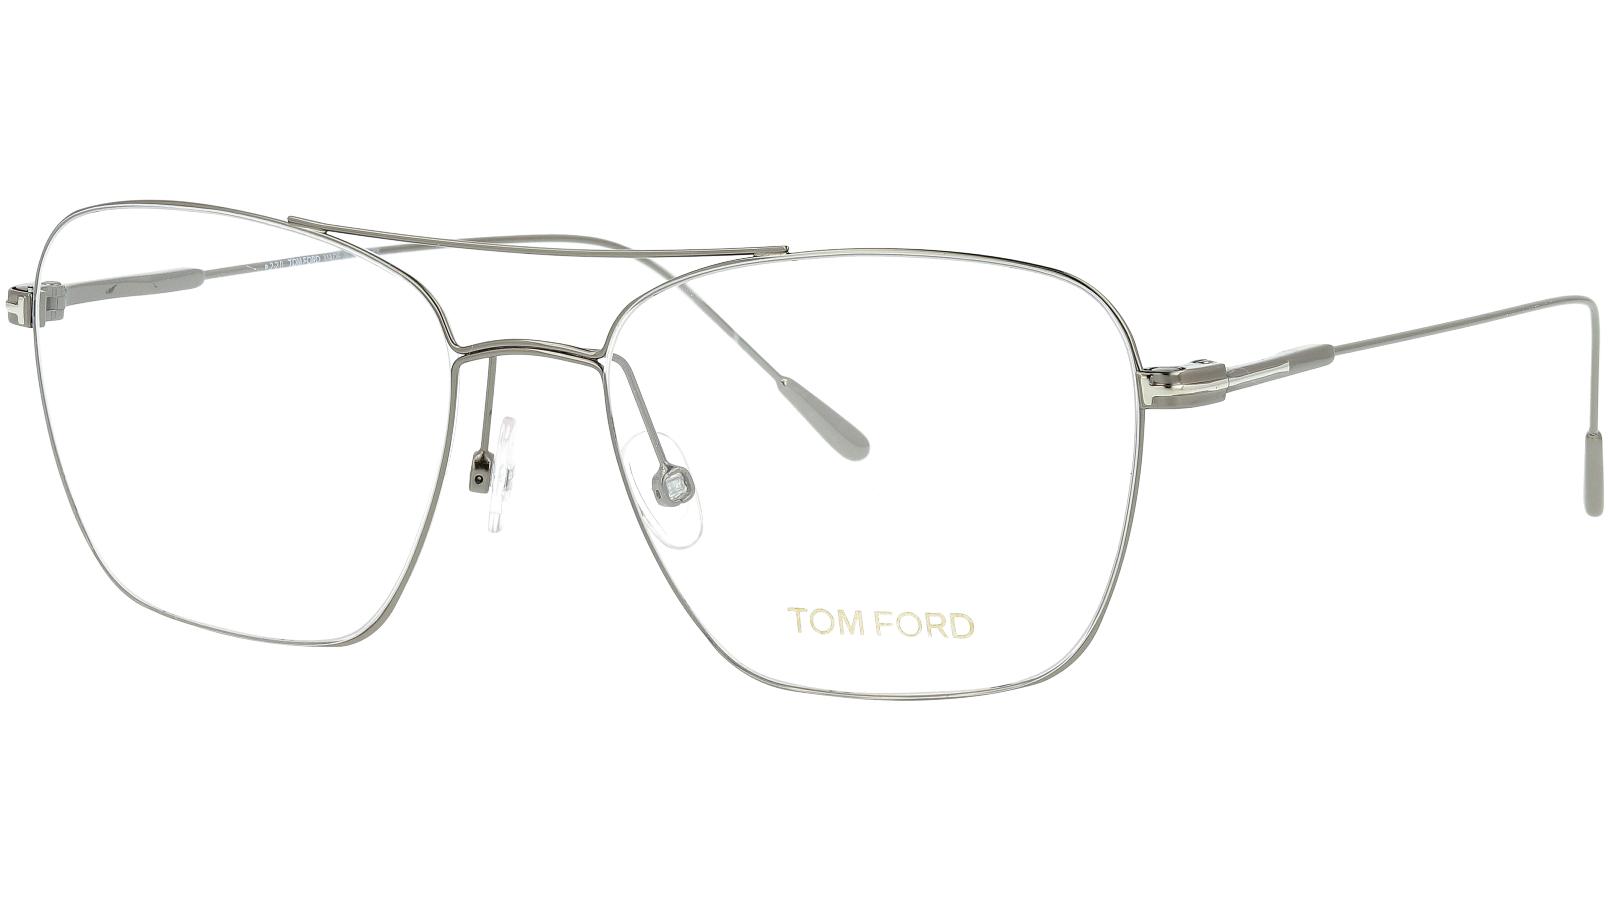 Tom Ford TF5604 008 54 GUNMETAL Glasses